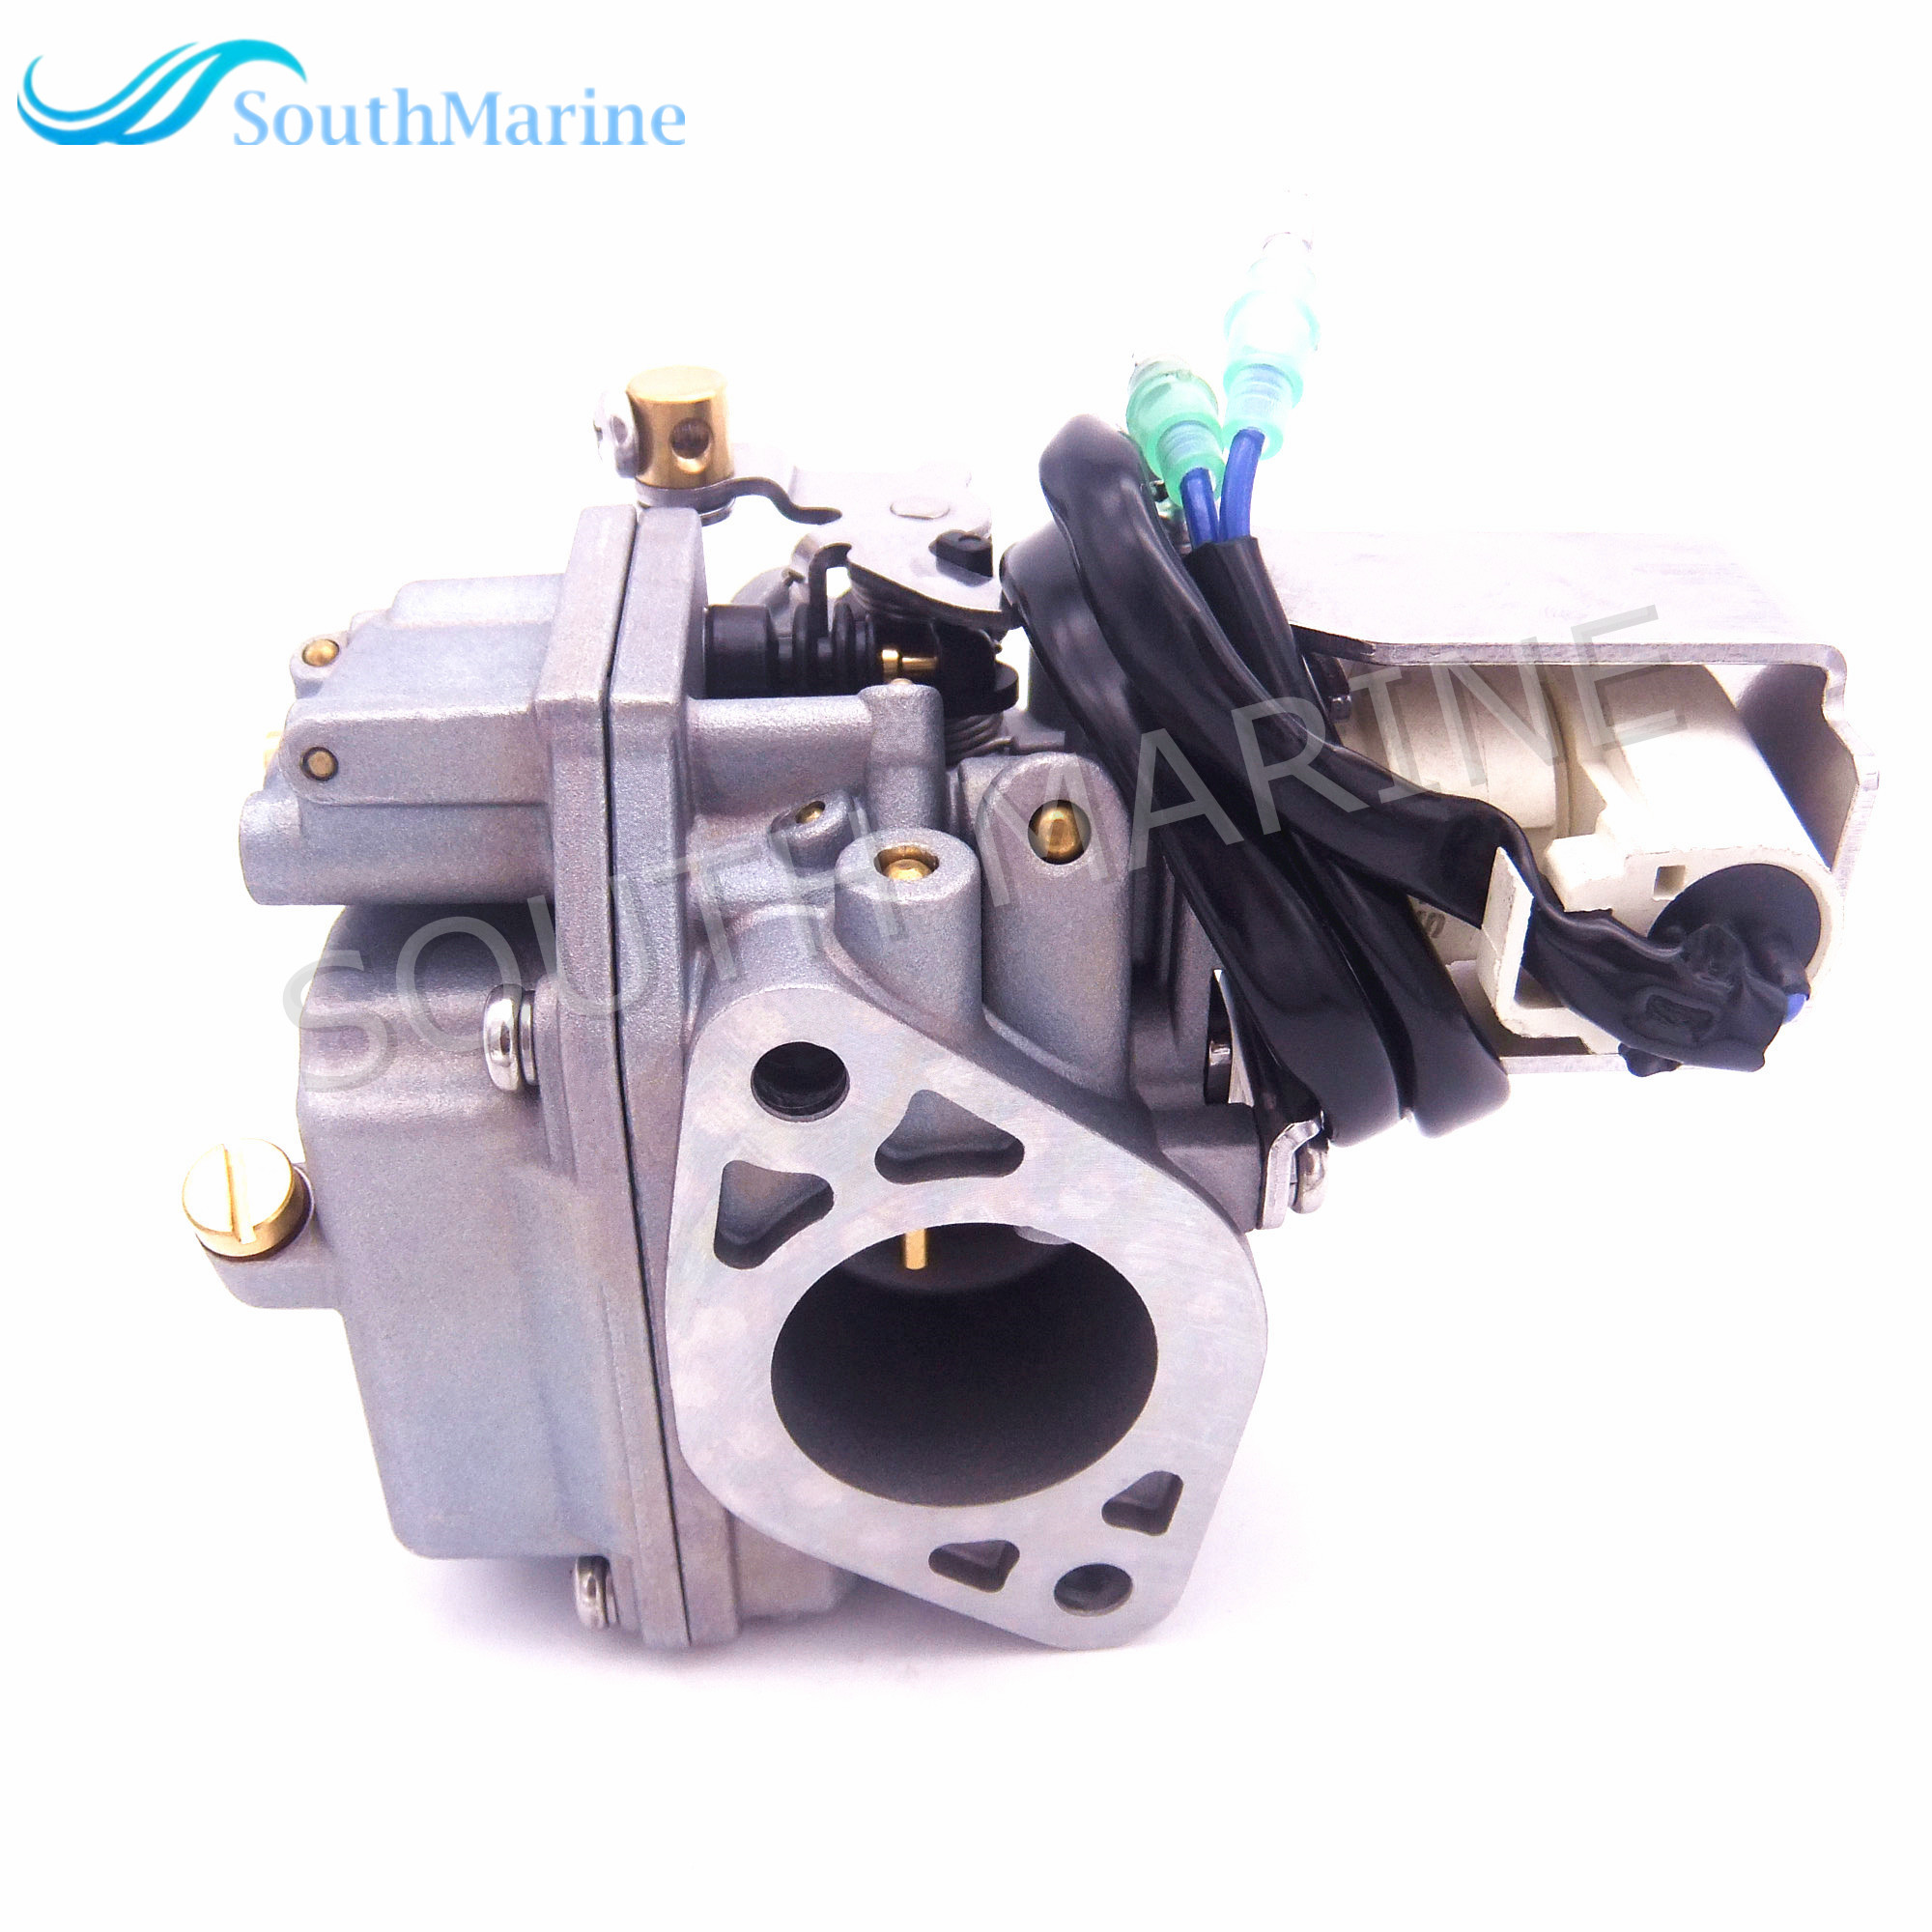 Outboard Engine Carburetor Assy 6AH 14301 00 6AH 14301 01 for Yamaha 4 stroke F20 F20BMHS